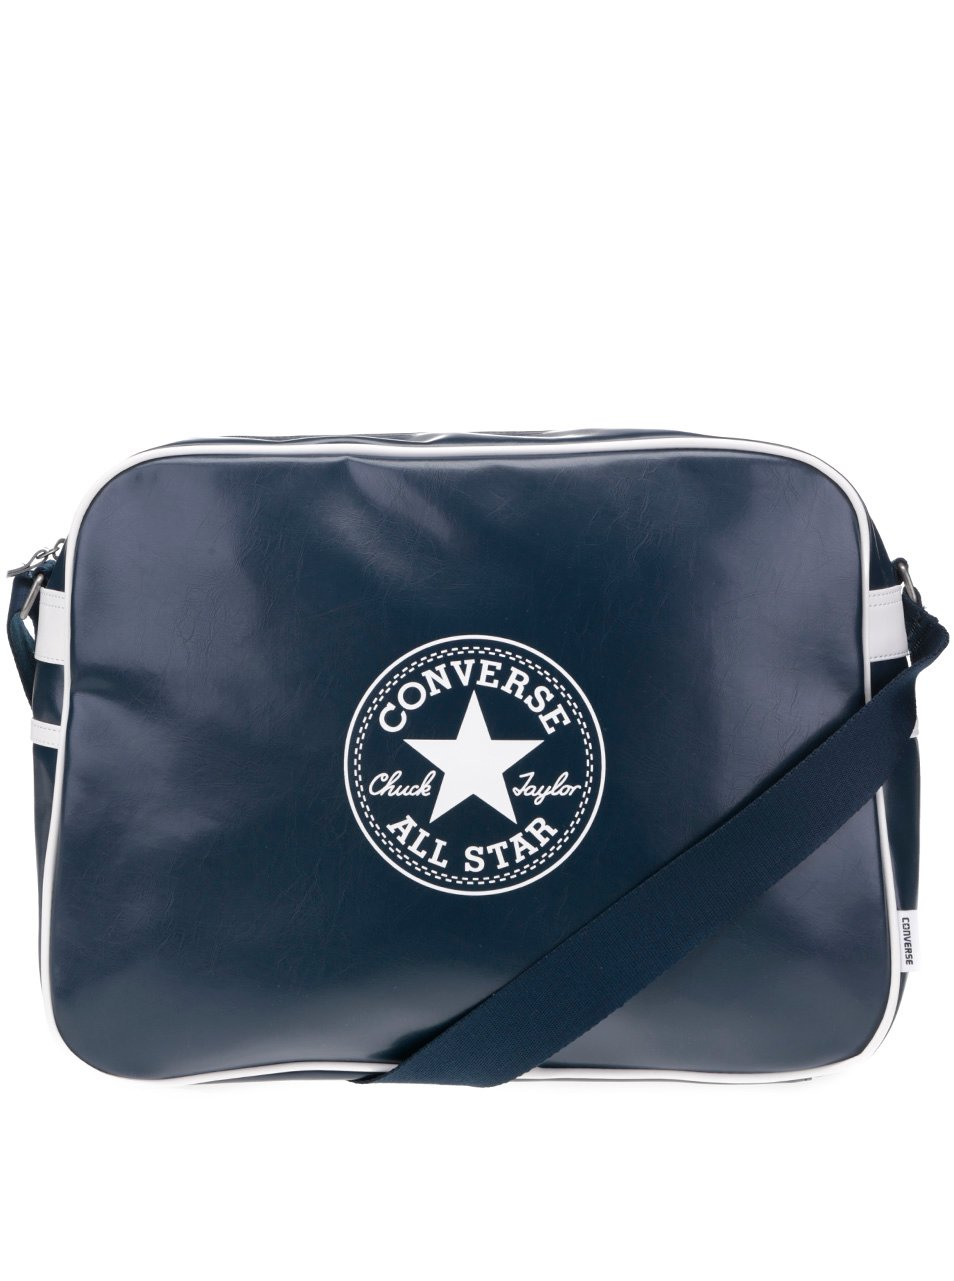 Tmavě modrá taška přes rameno Converse   PánskáTaška.cz™ ab3da3396ac